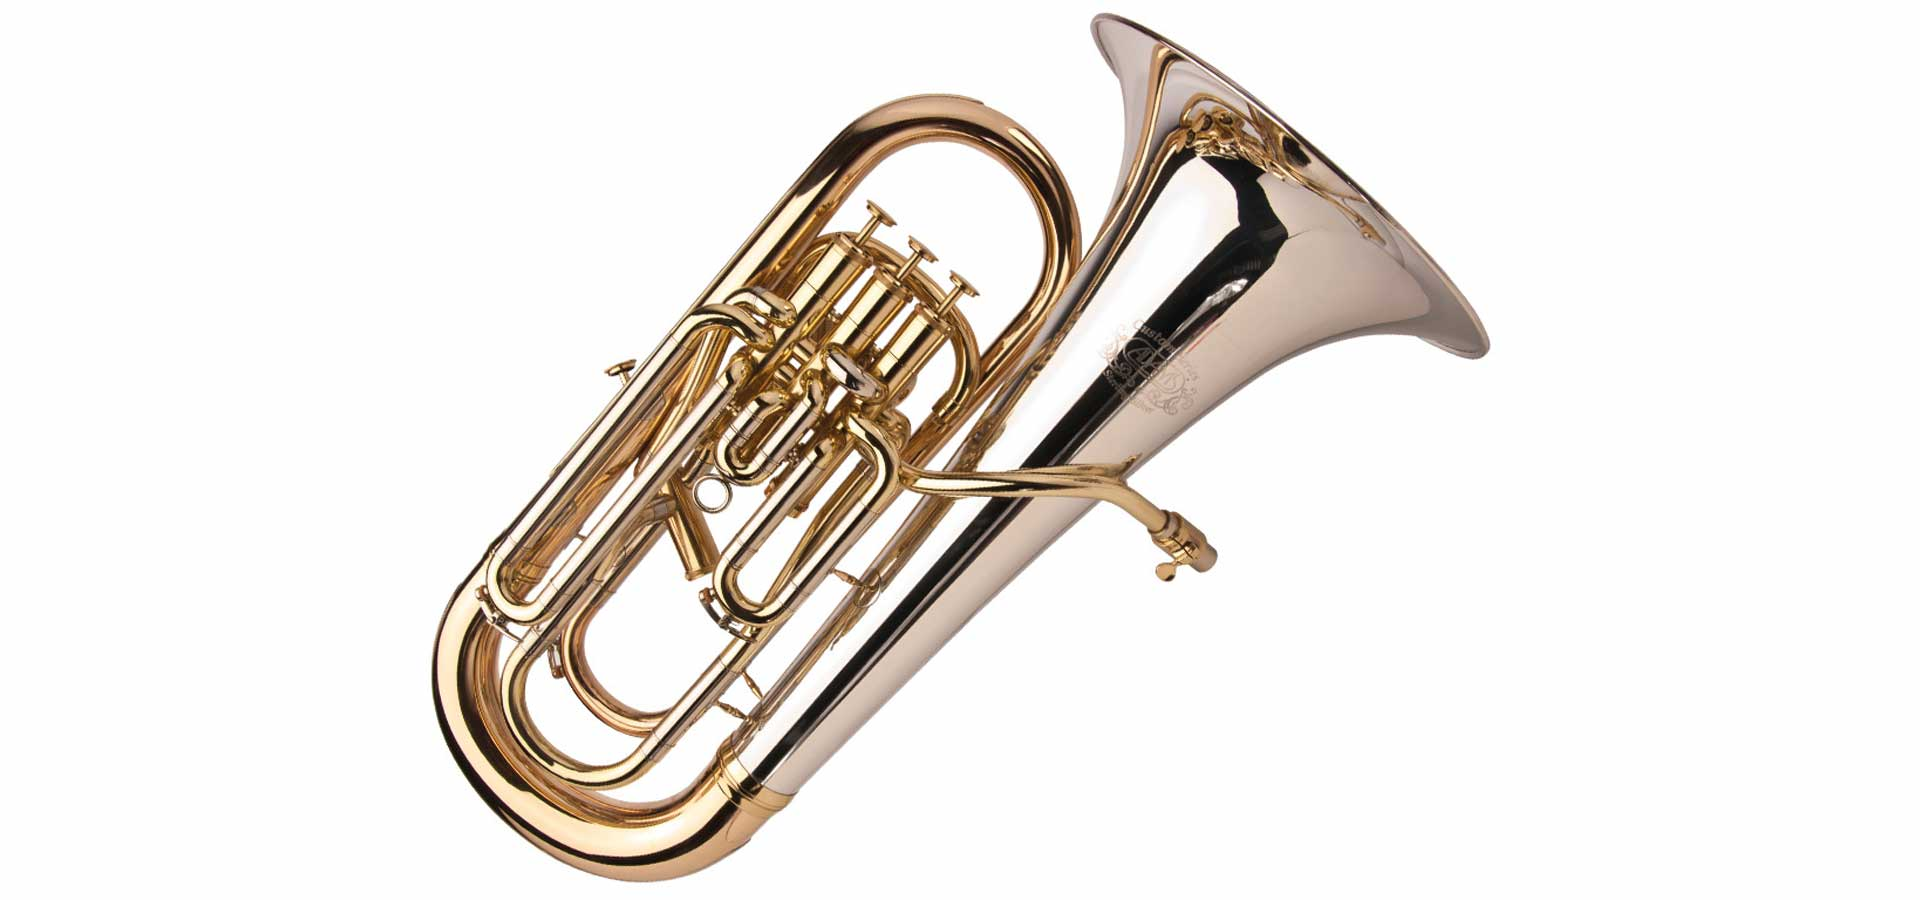 1920x900 Fultone Brass The Uk Home Of The Adams Custom Series Brass